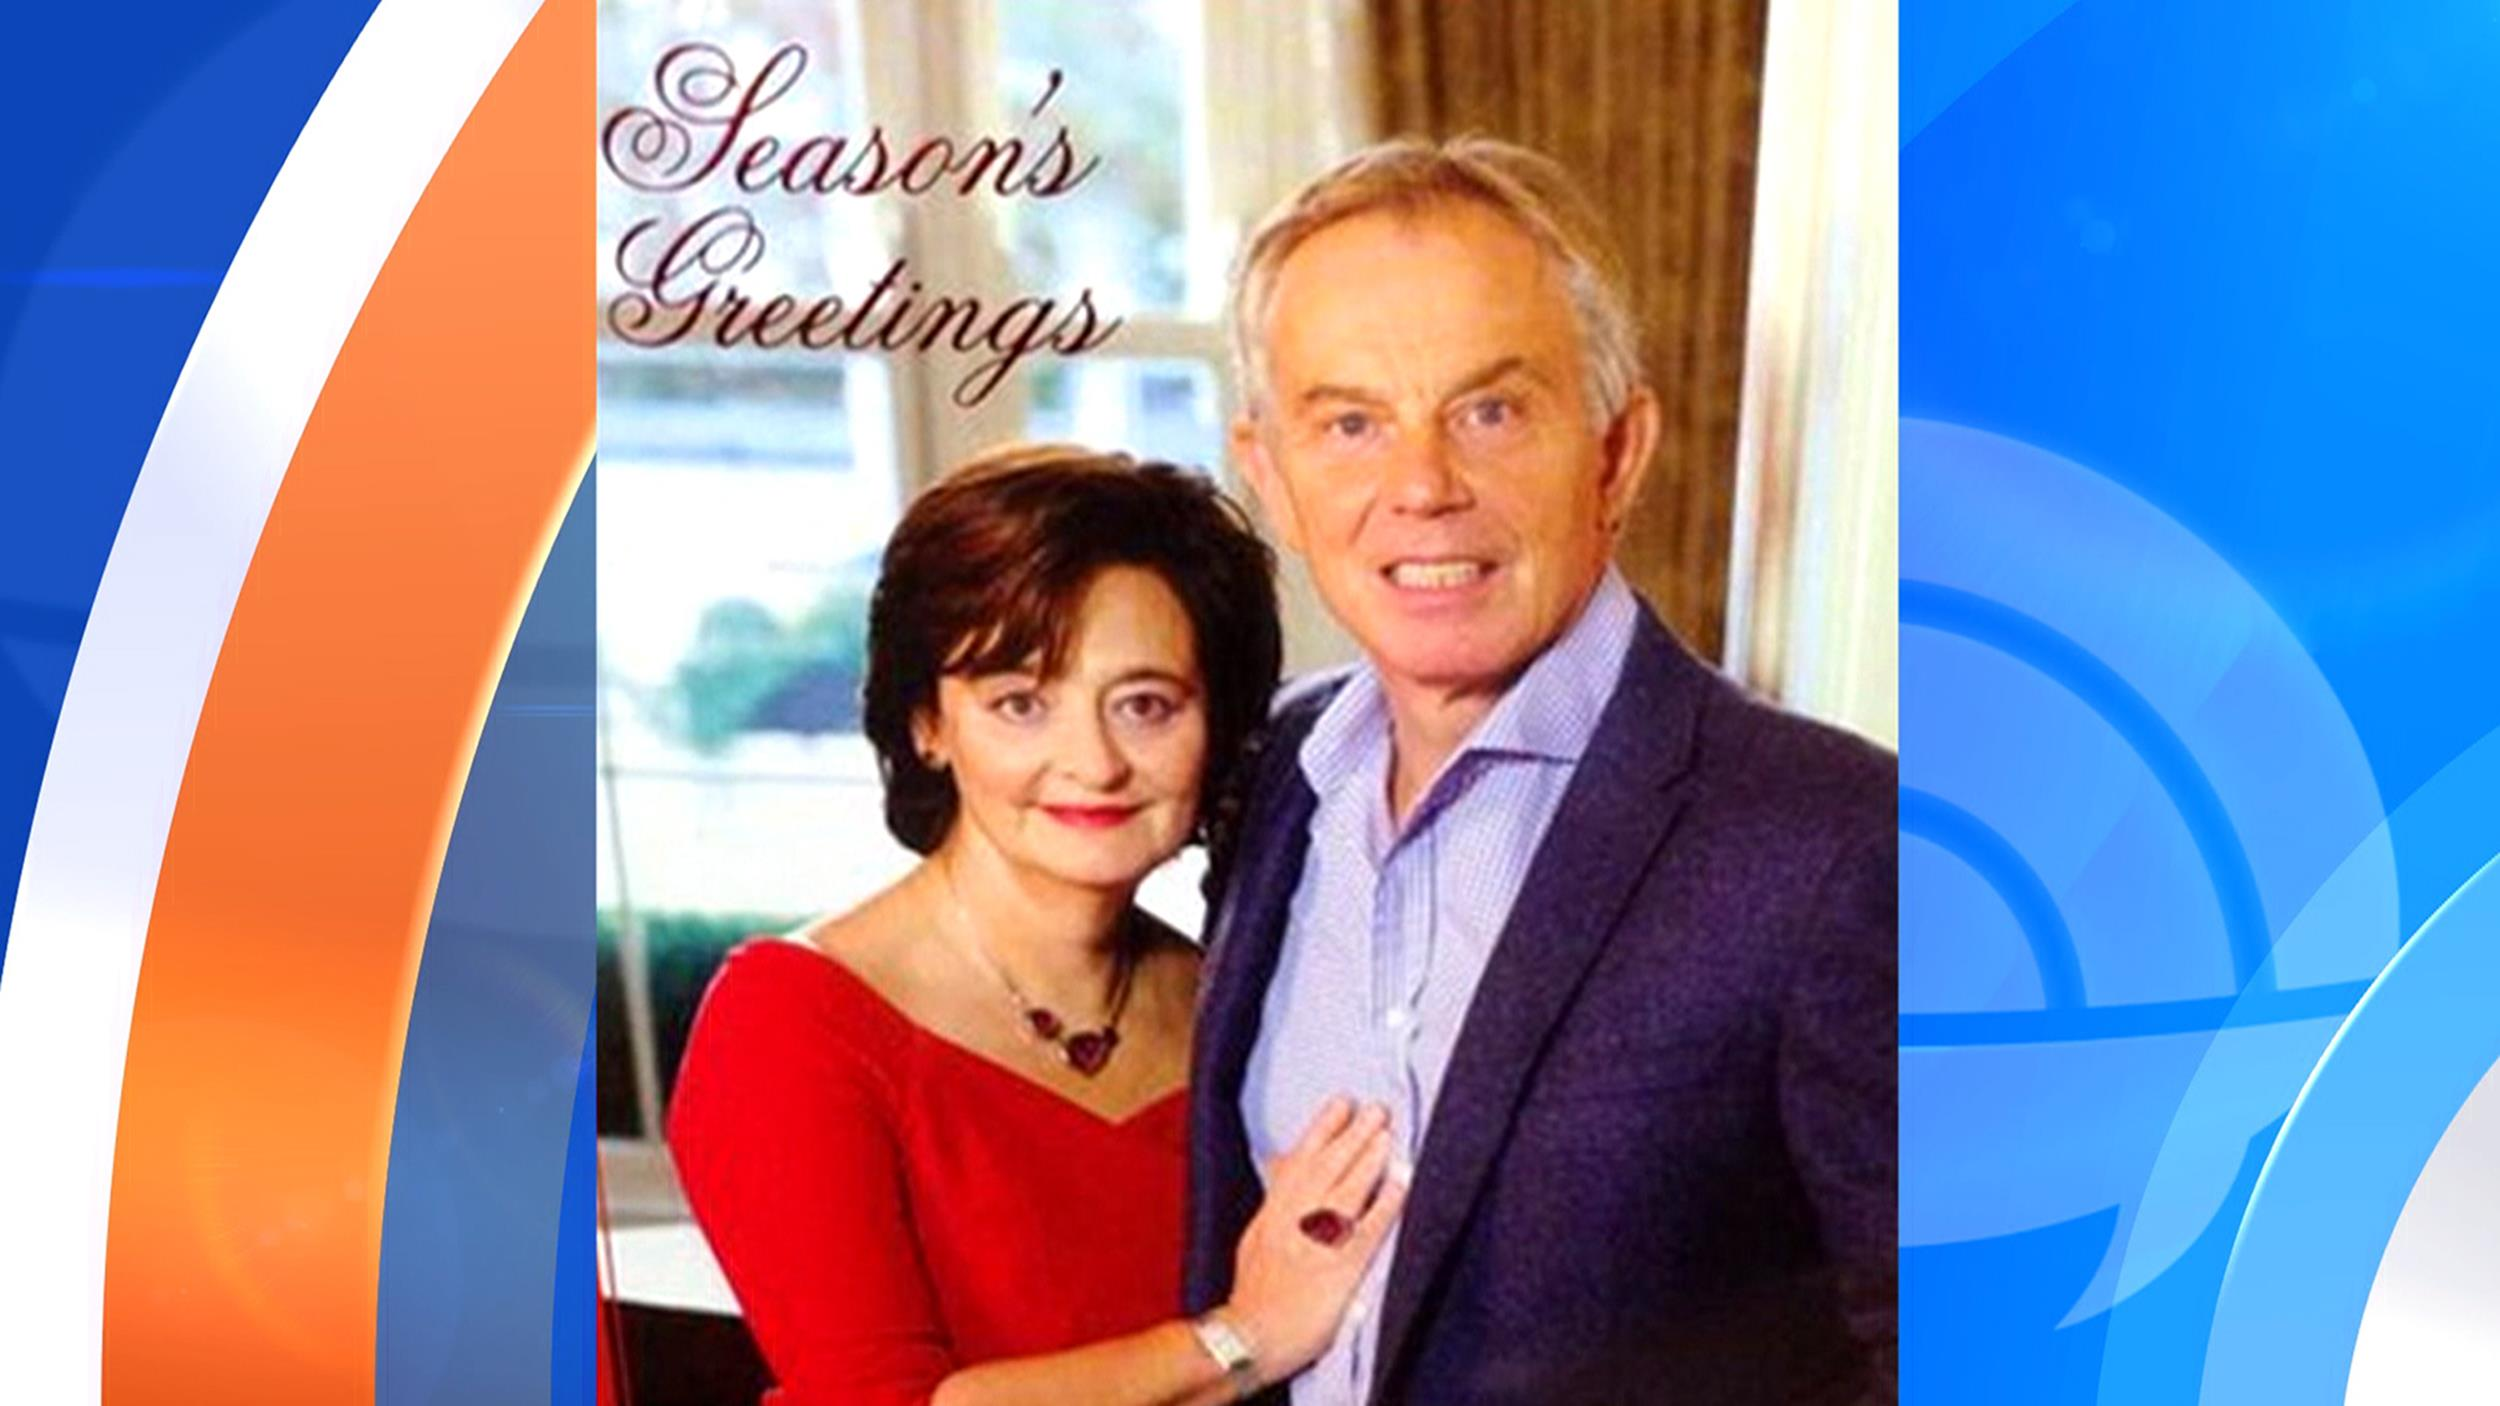 Twitter Mocks Tony Blair's 'Terrifying' Christmas Card - NBC News